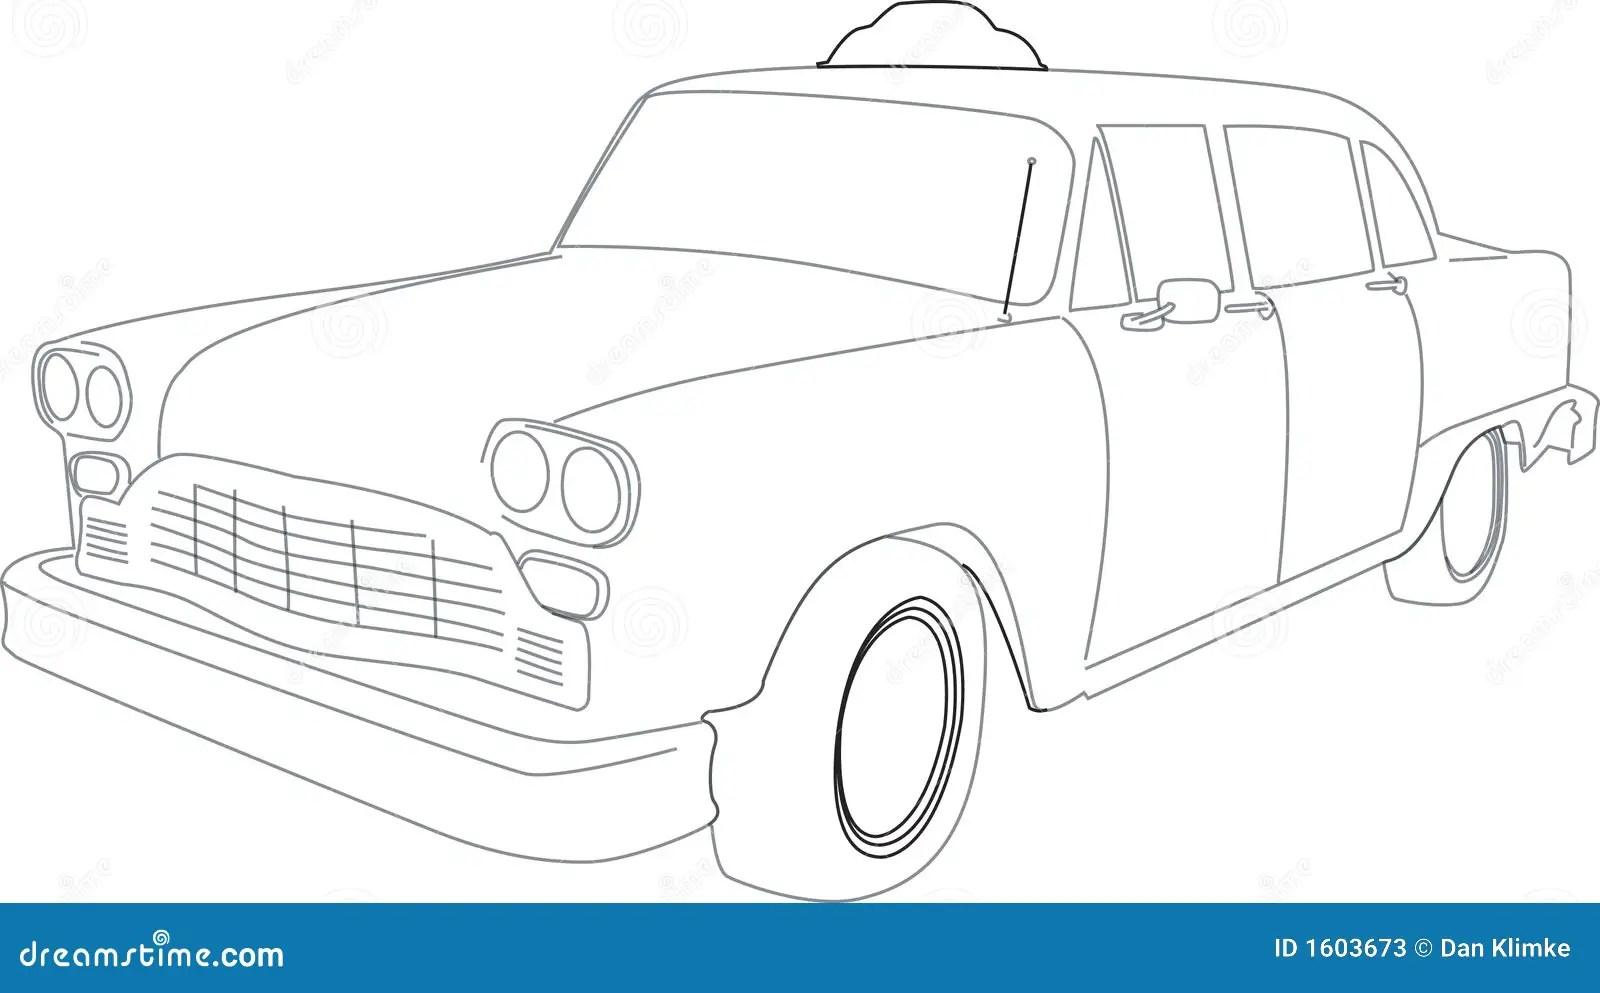 Illustration Of A Taxi Cab Stock Photos